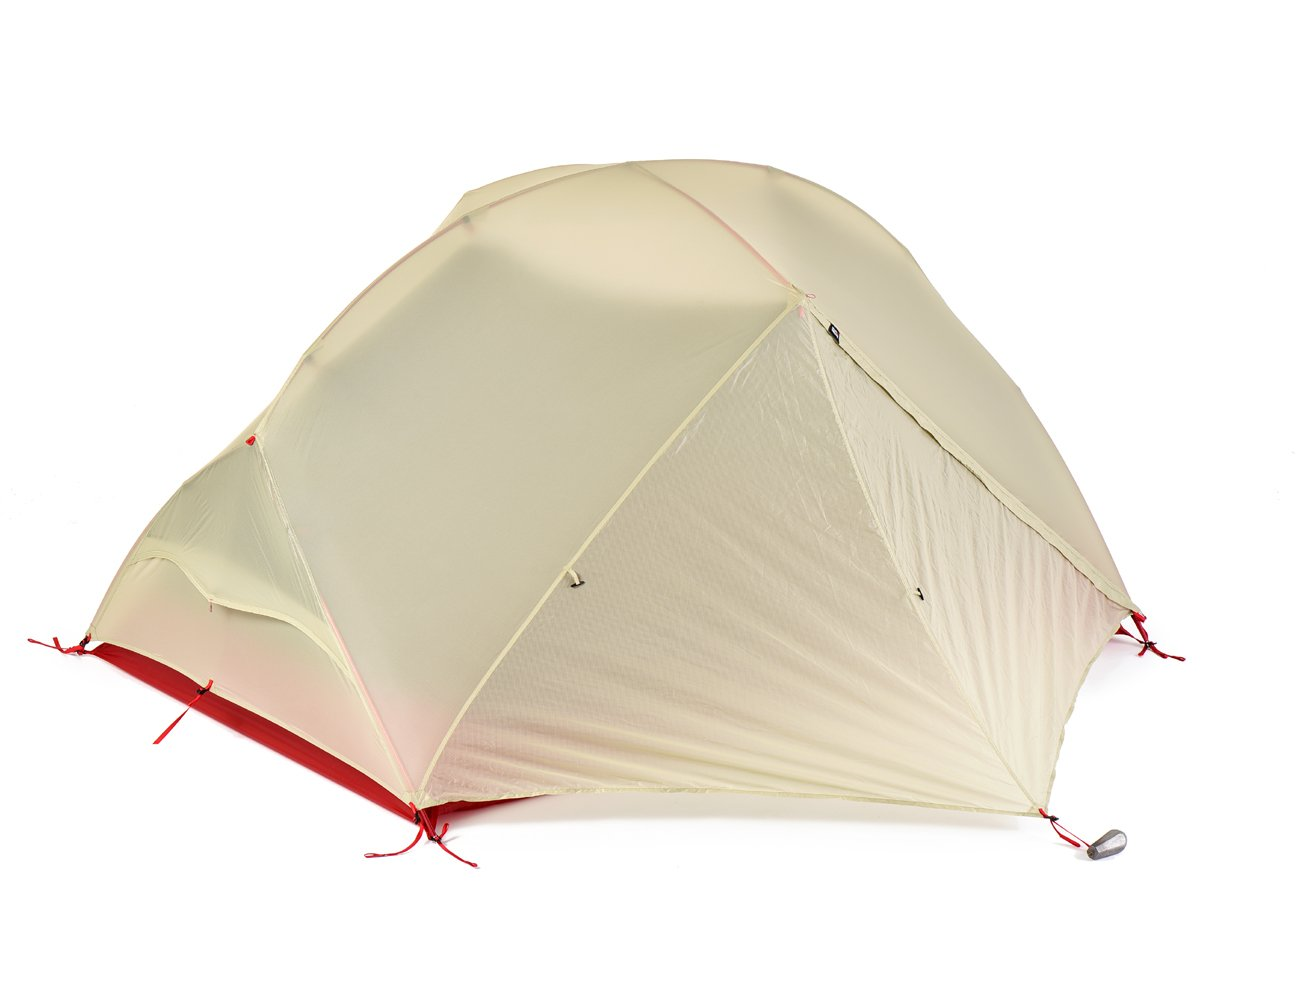 Desert Walker超軽量2人用折りたたみ持ち運び式風防止水防止キャンプテント(四季テント)   B0753B7CTX